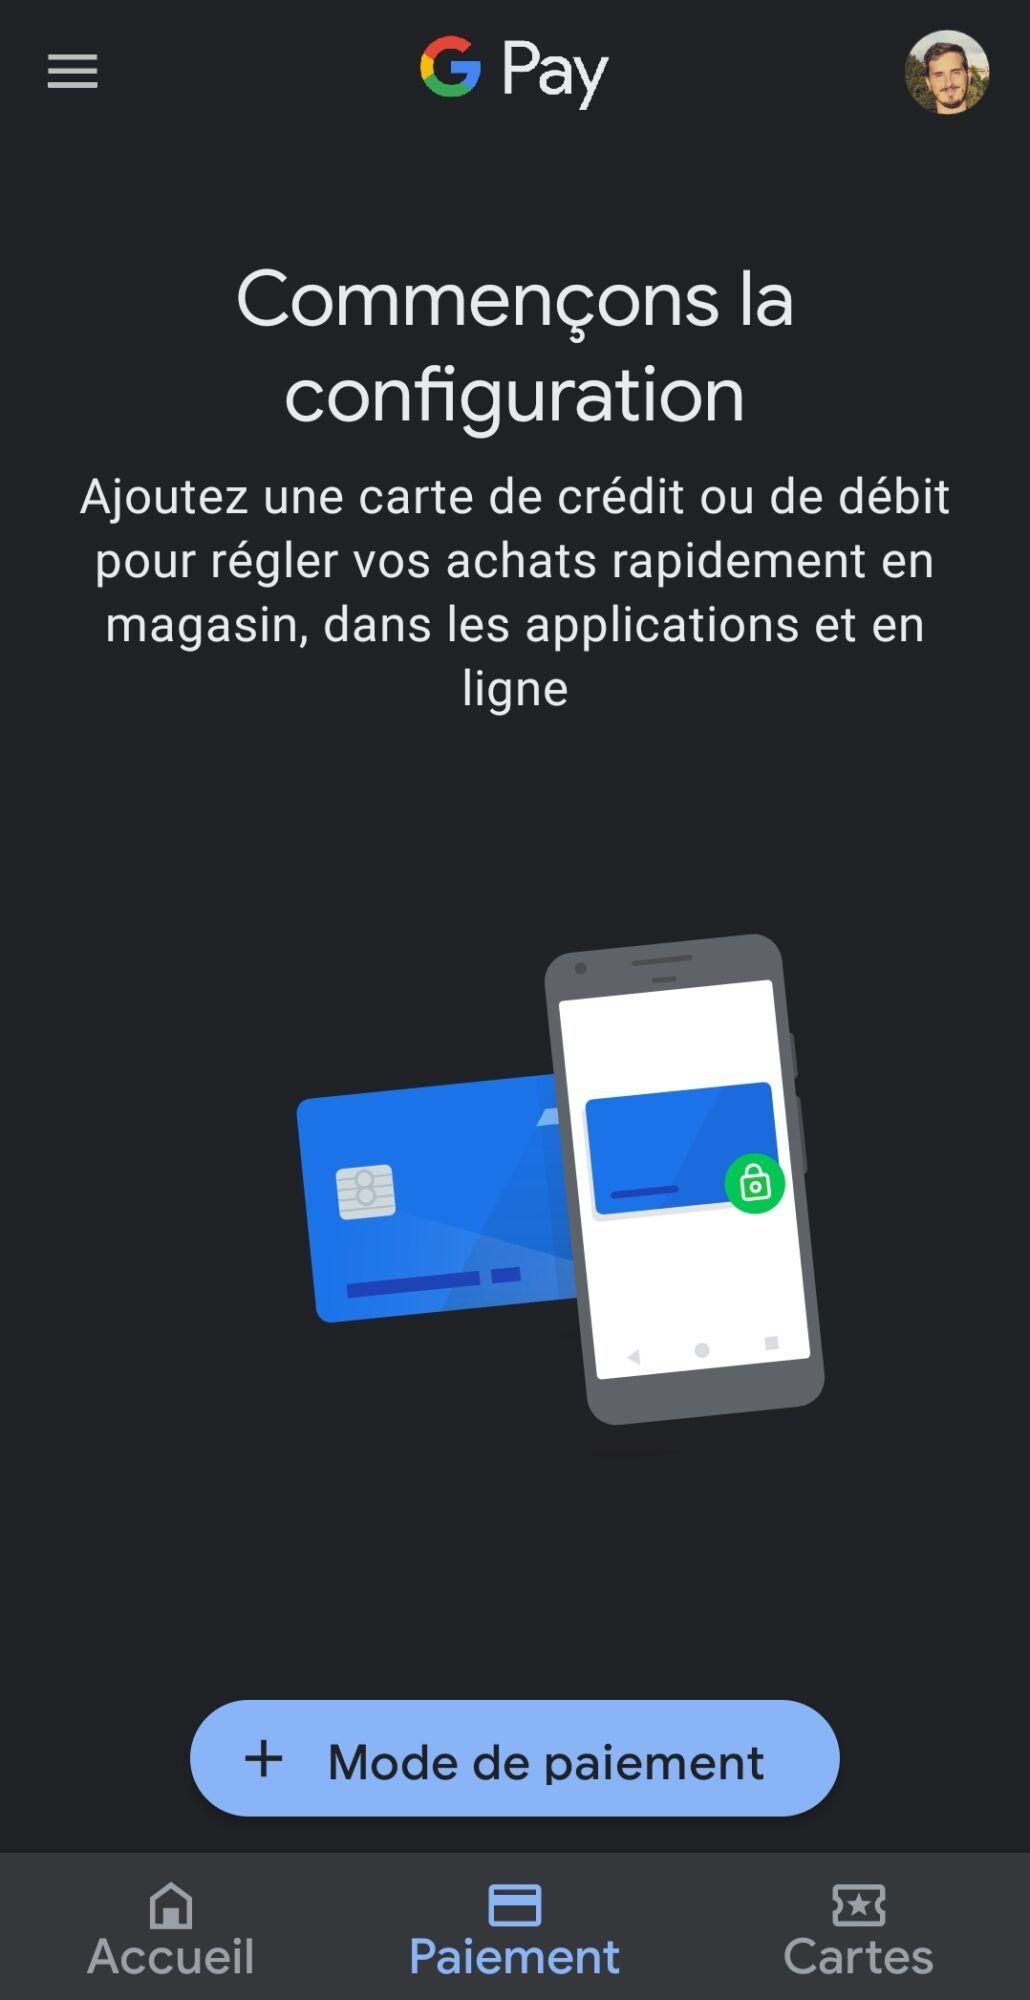 configurer-carte-paiement-sans-contact-google-pay-smartphone-android